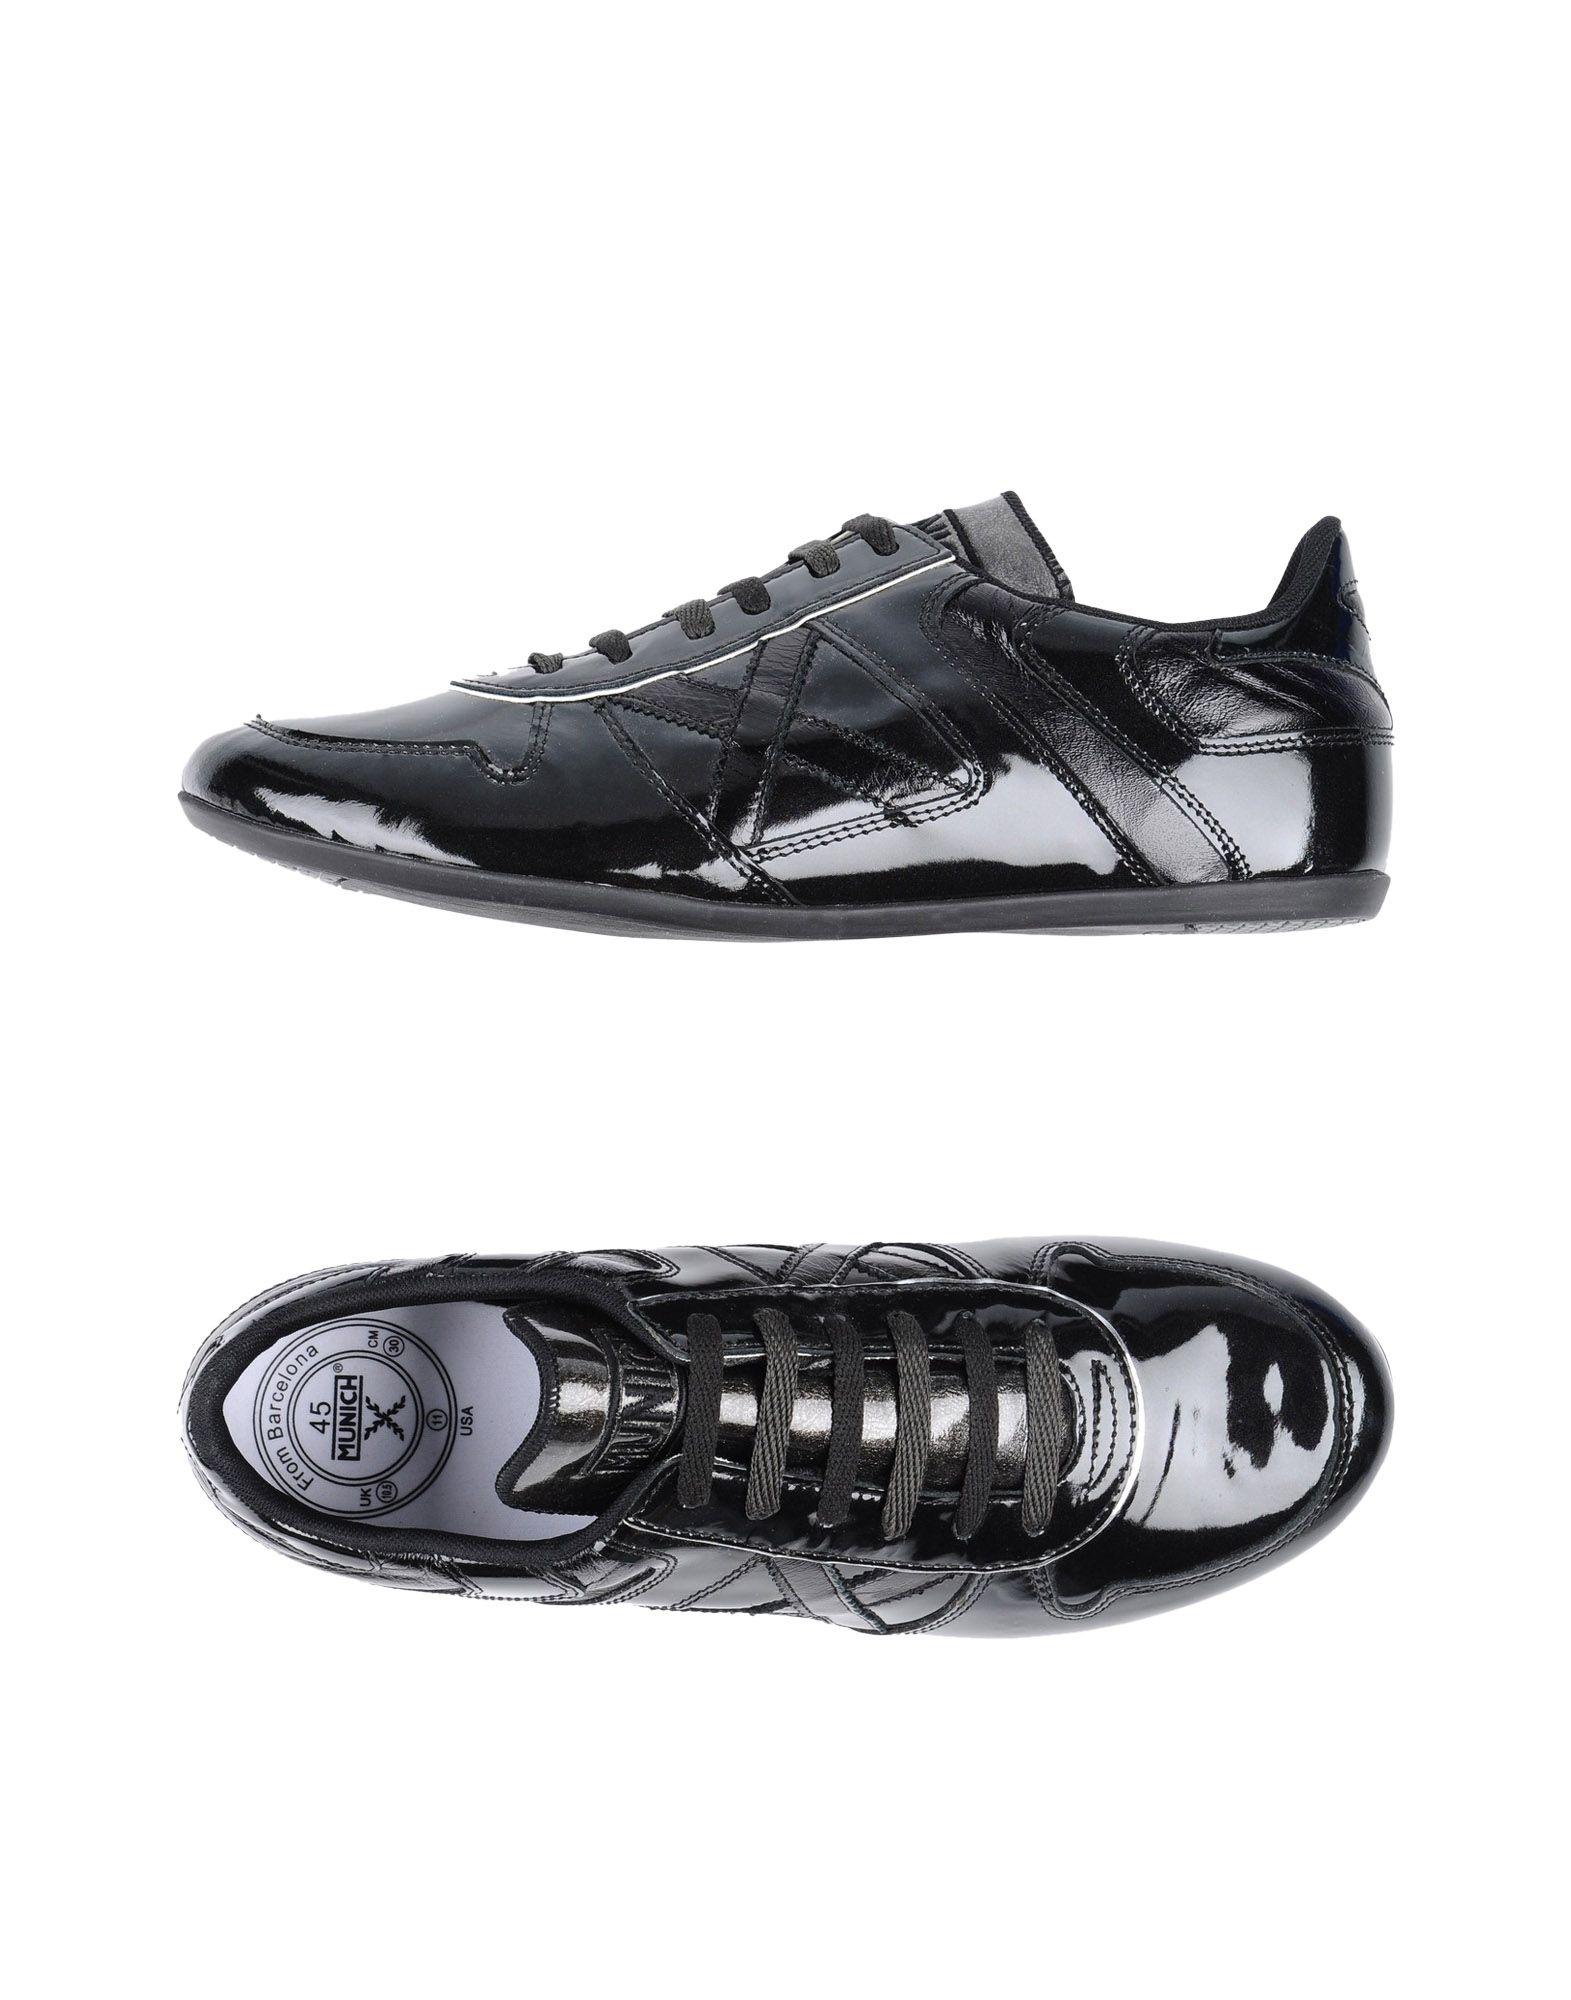 Sneakers Munich Homme - Sneakers Munich sur